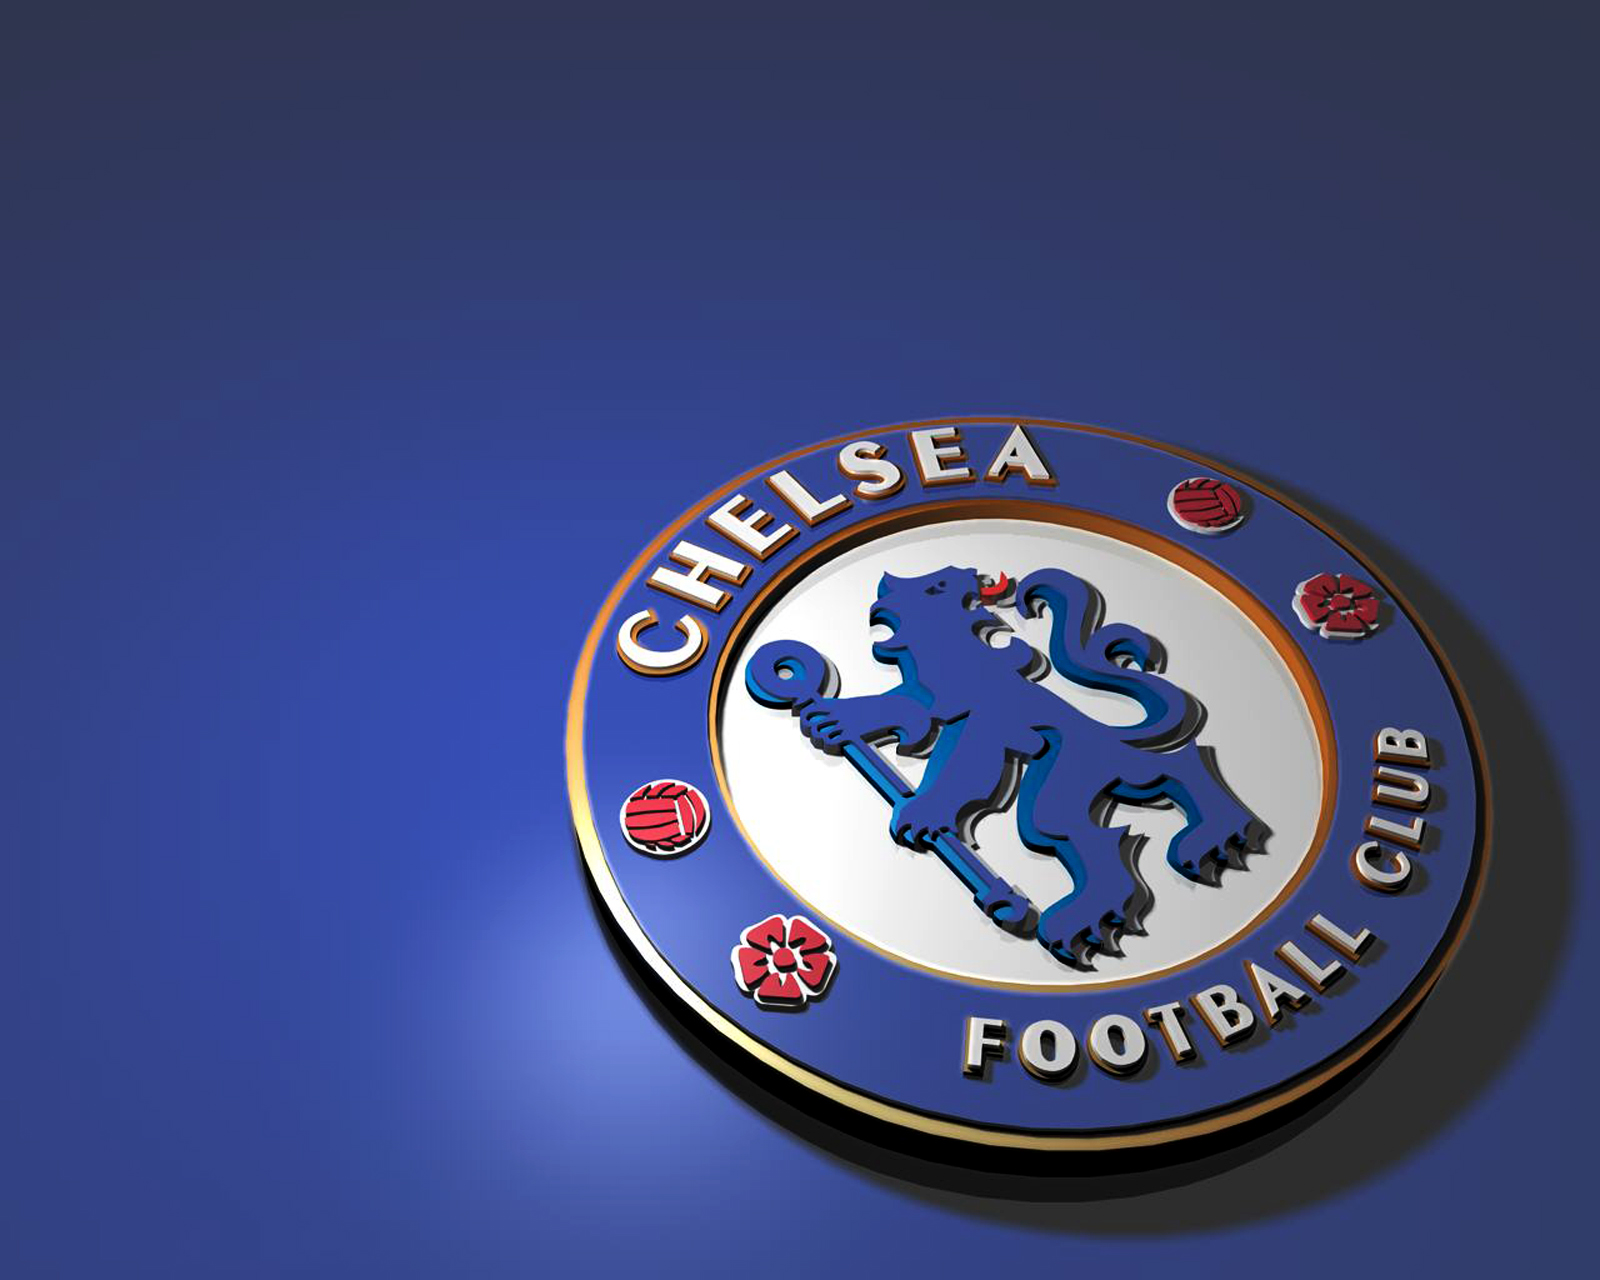 http://3.bp.blogspot.com/-IpjQI4TO9dc/T6Usx6W_WZI/AAAAAAAABjk/IbsnbNNYlAE/s1600/Chelsea_Football_Club_3D_Logo_HD_Wallpaper-Vvallpaper.Net.jpg